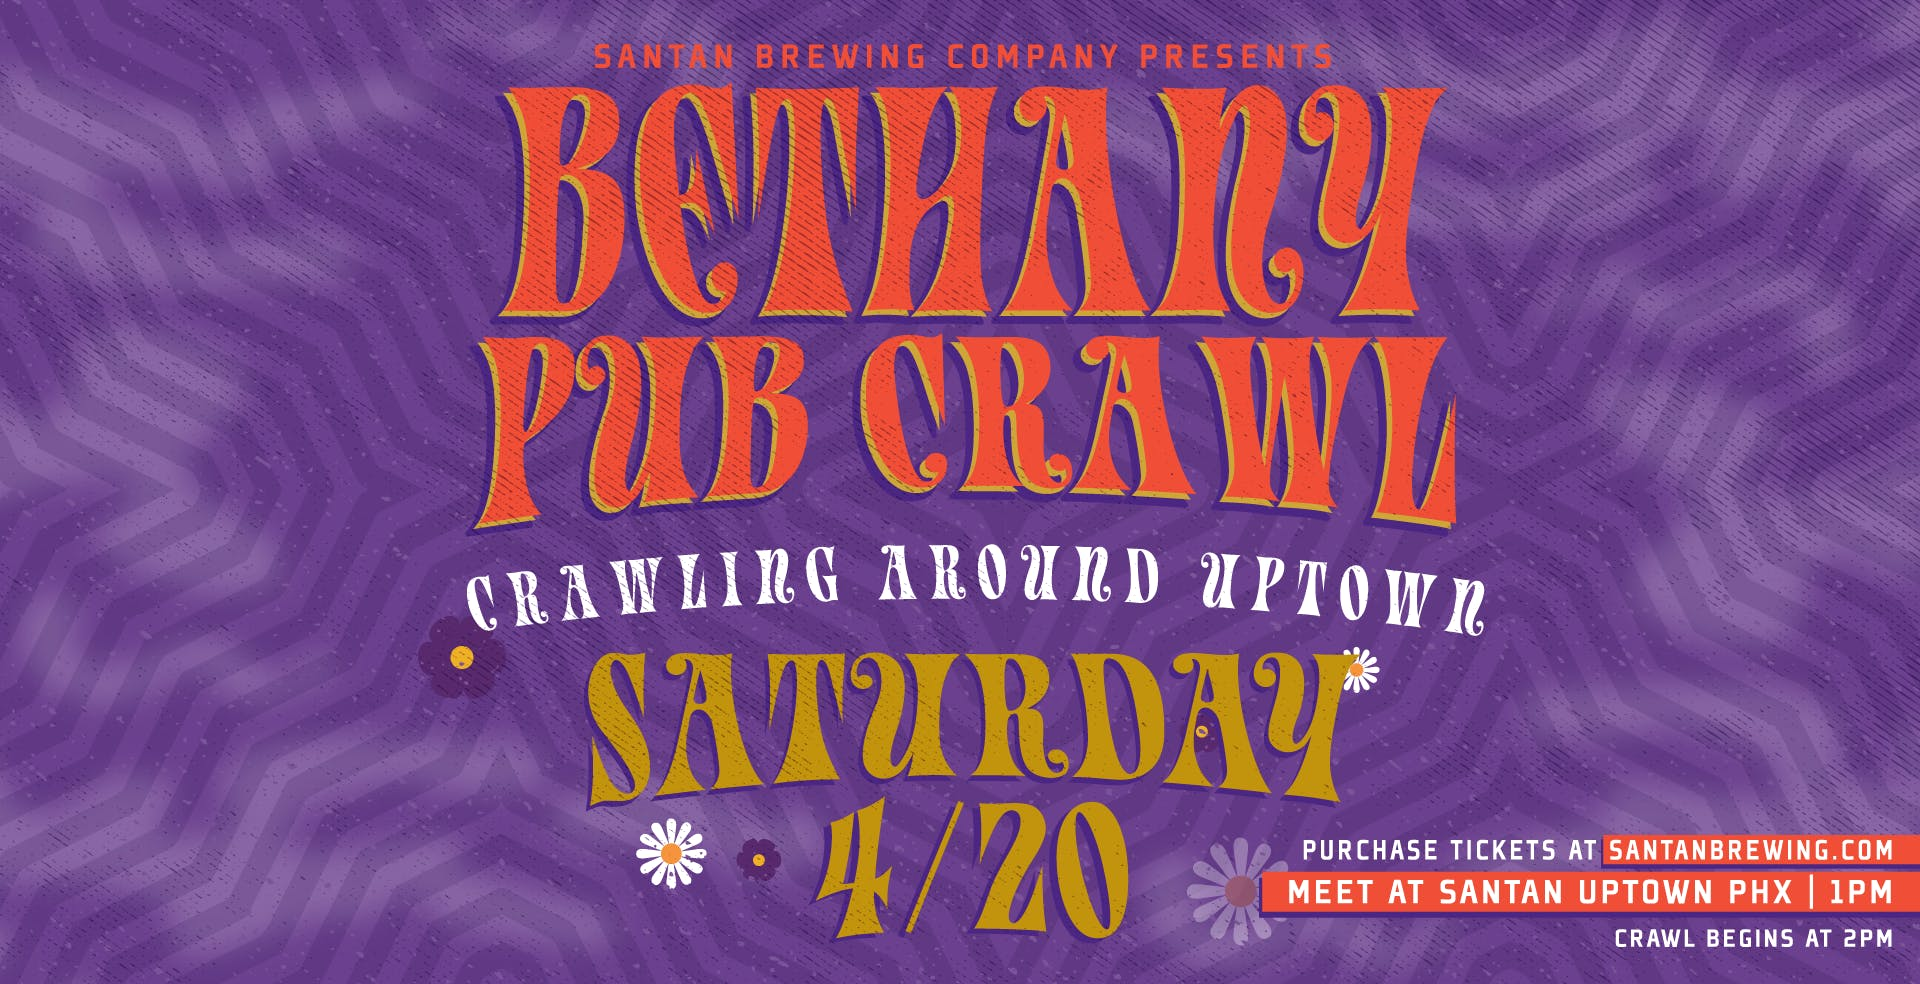 Bethany Pub Crawl